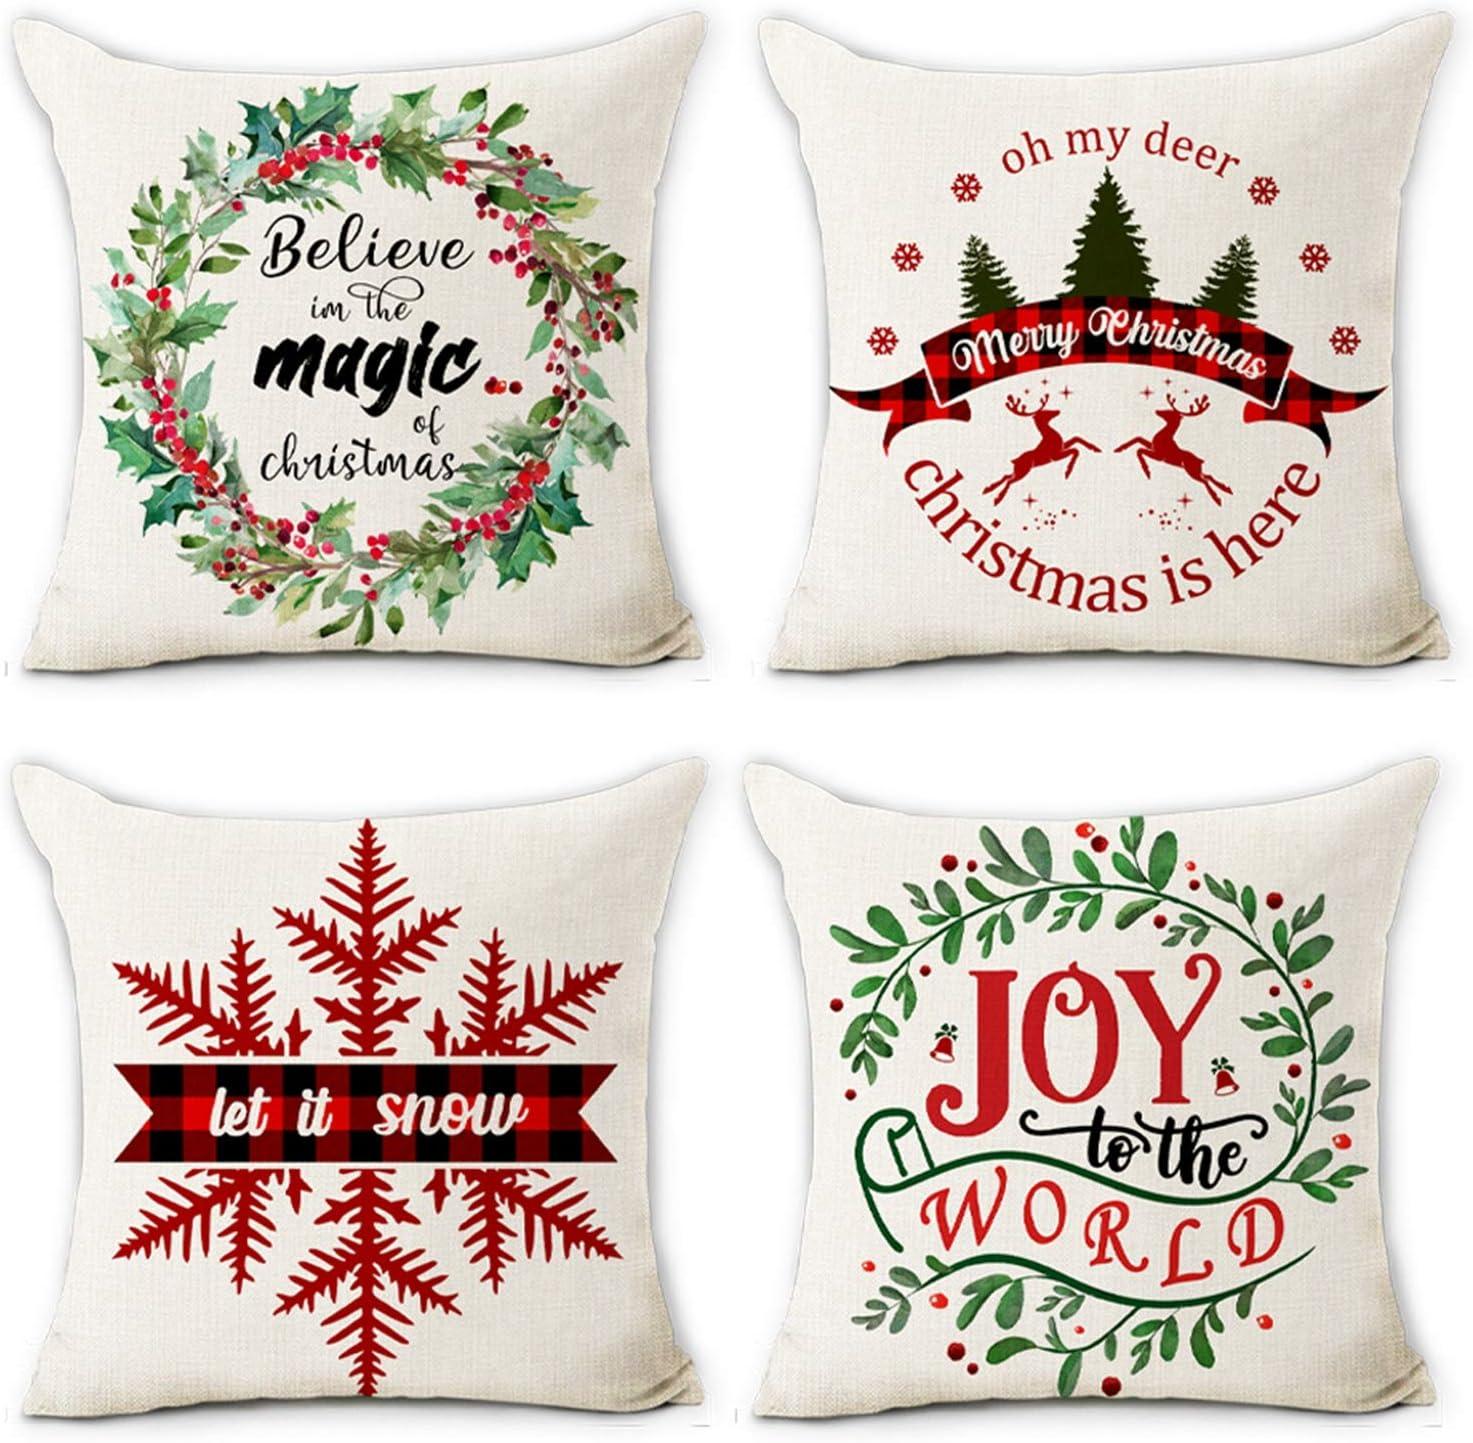 Hexagram Christmas Pillow Covers 18x18 Set of 4 Cotton Line Farmhouse Home Decor Cusion Pillow Case Winter Holiday Christmas Throw Pillow Cover